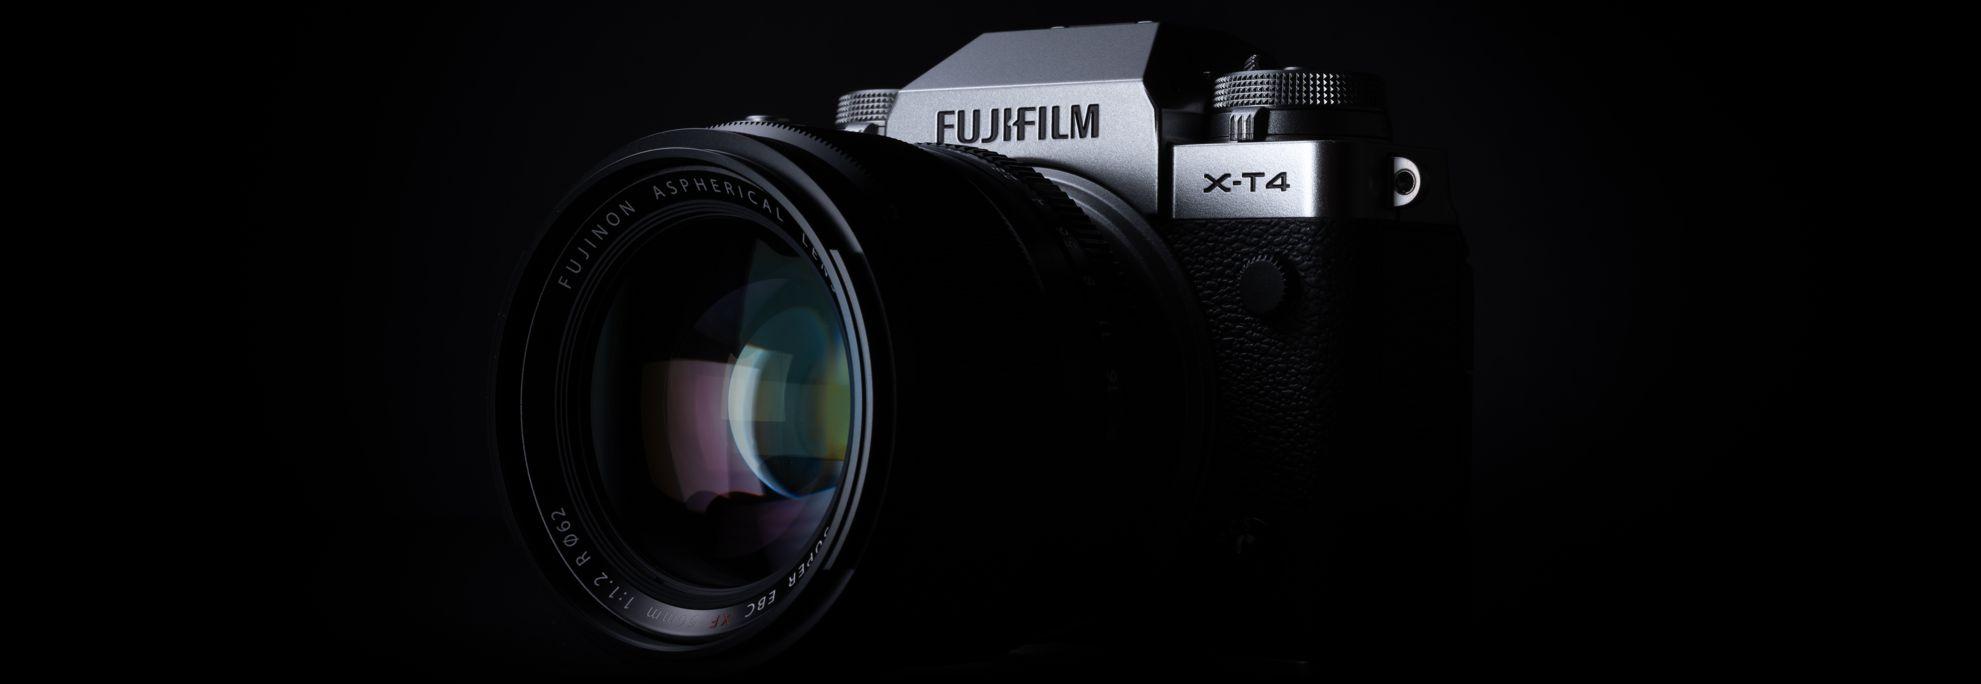 FUJIFILM-X-T4_Banner-1